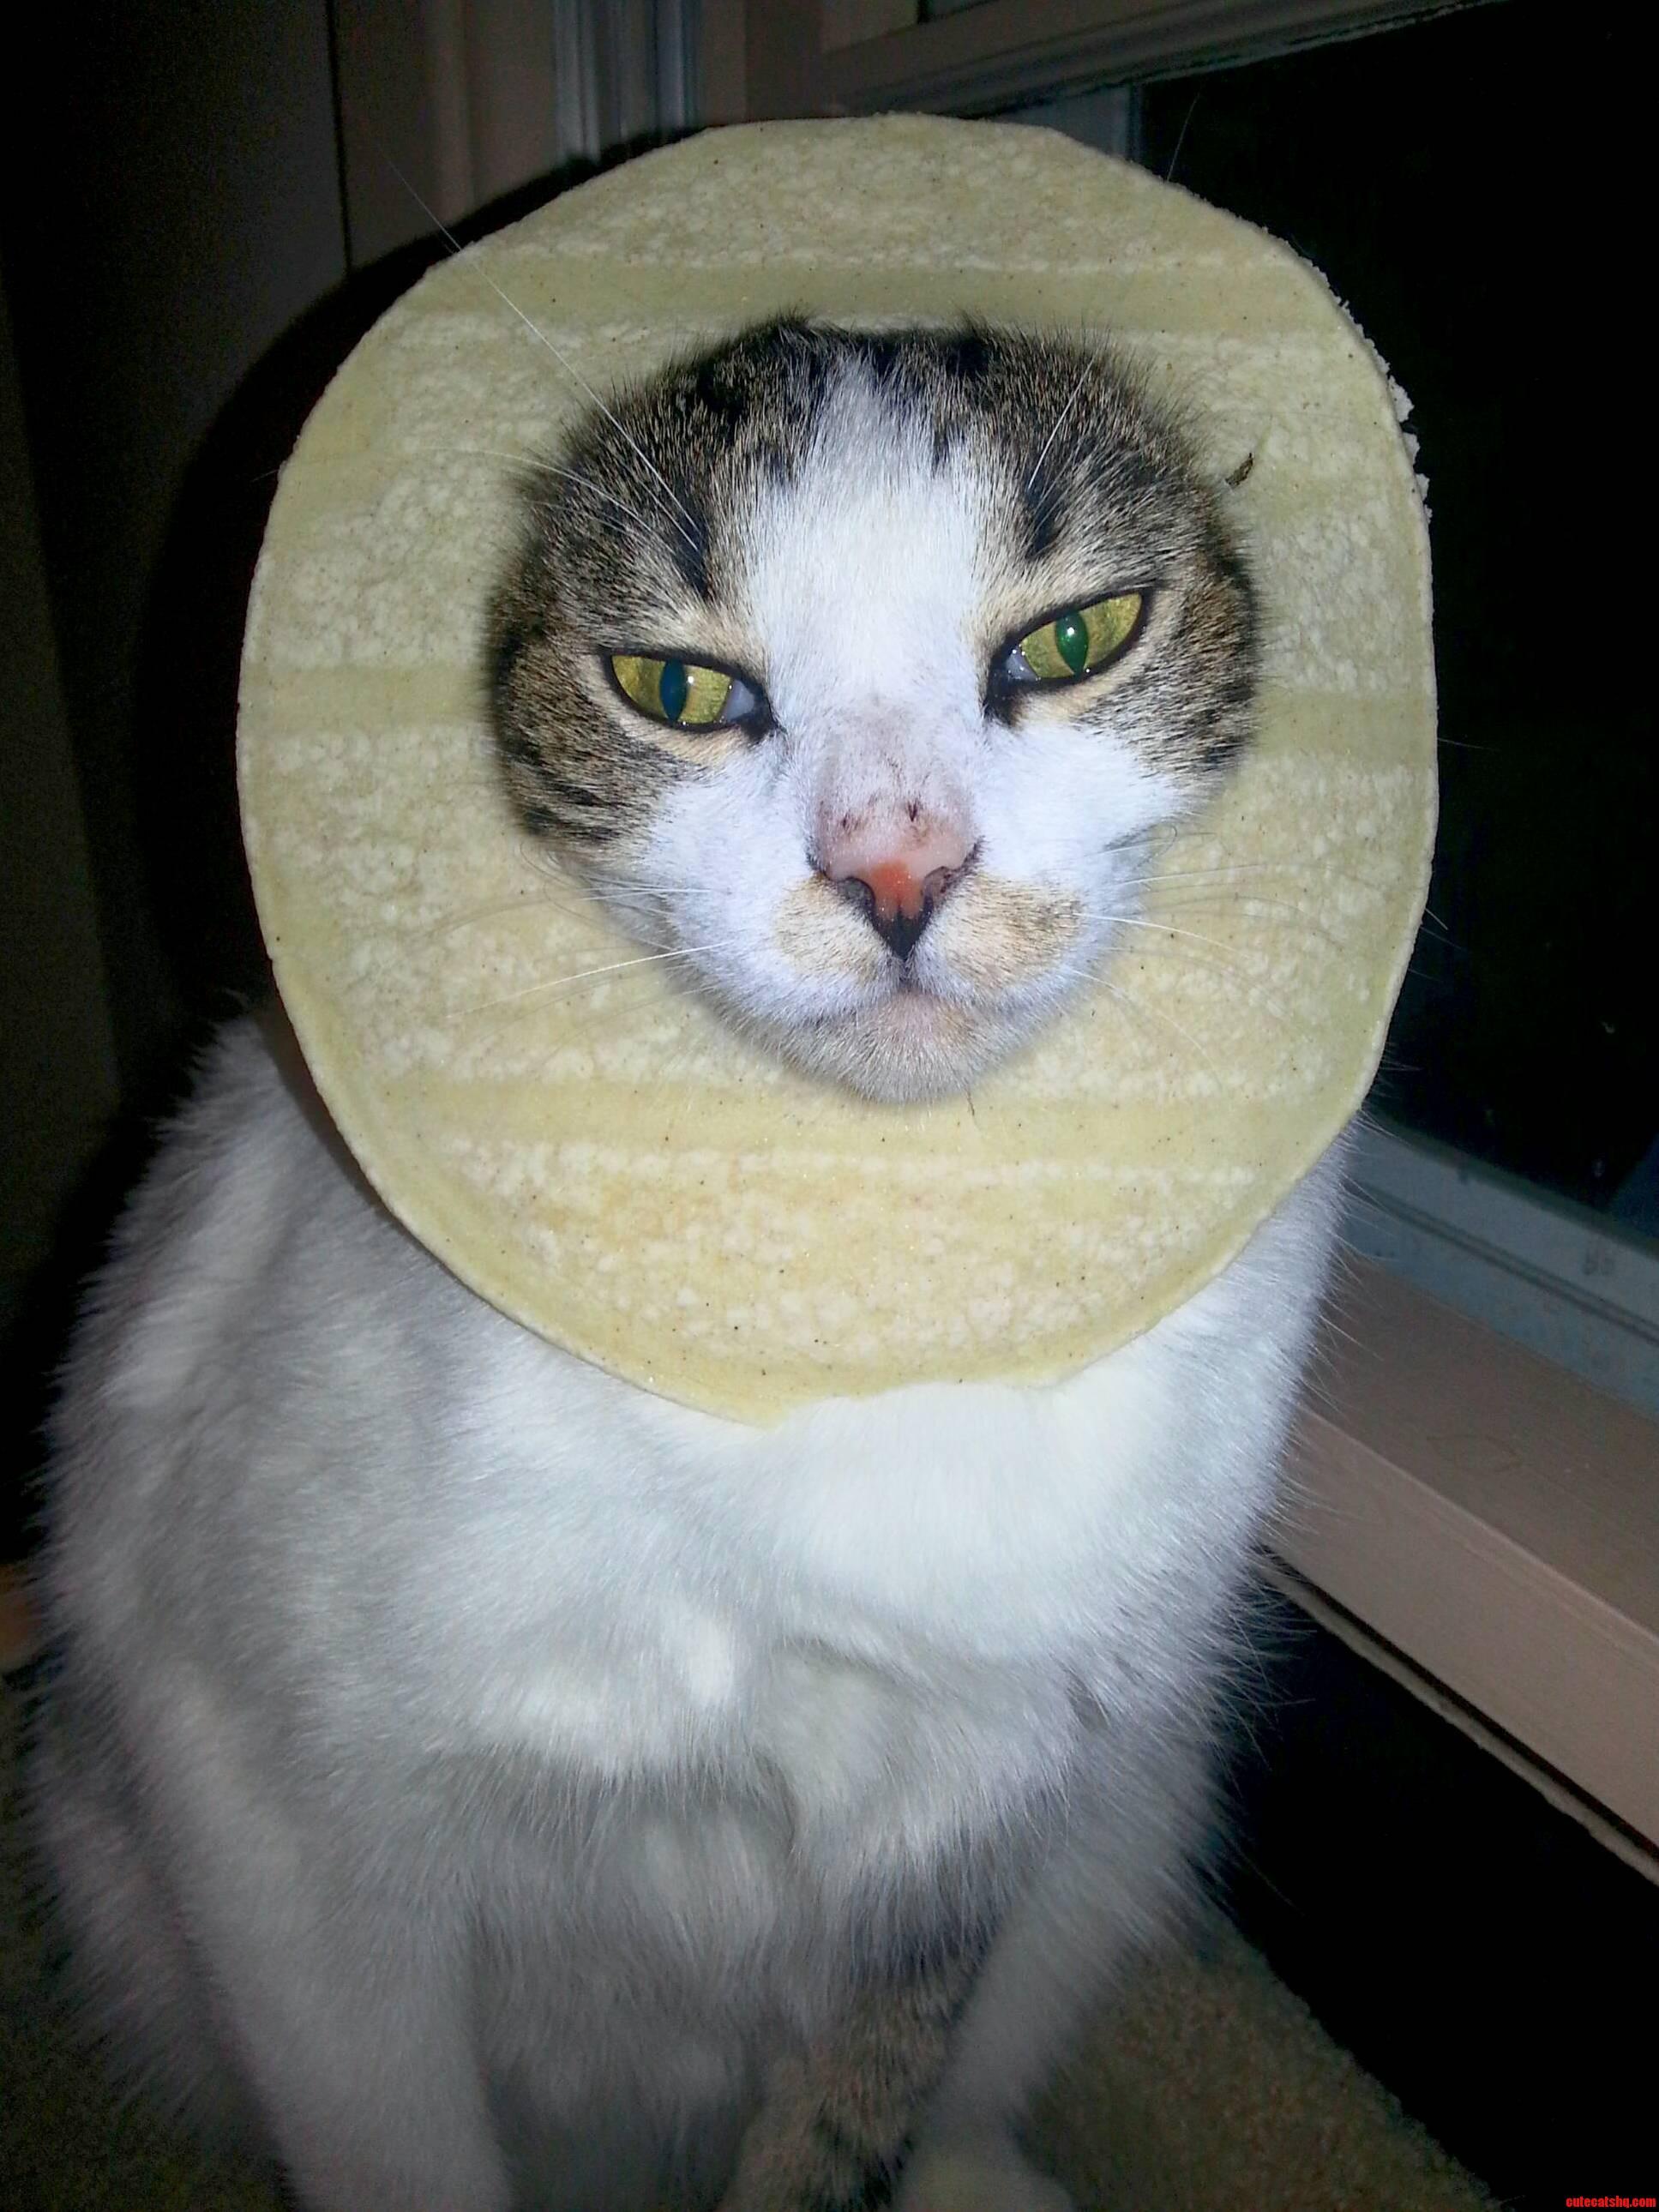 My taco cat.